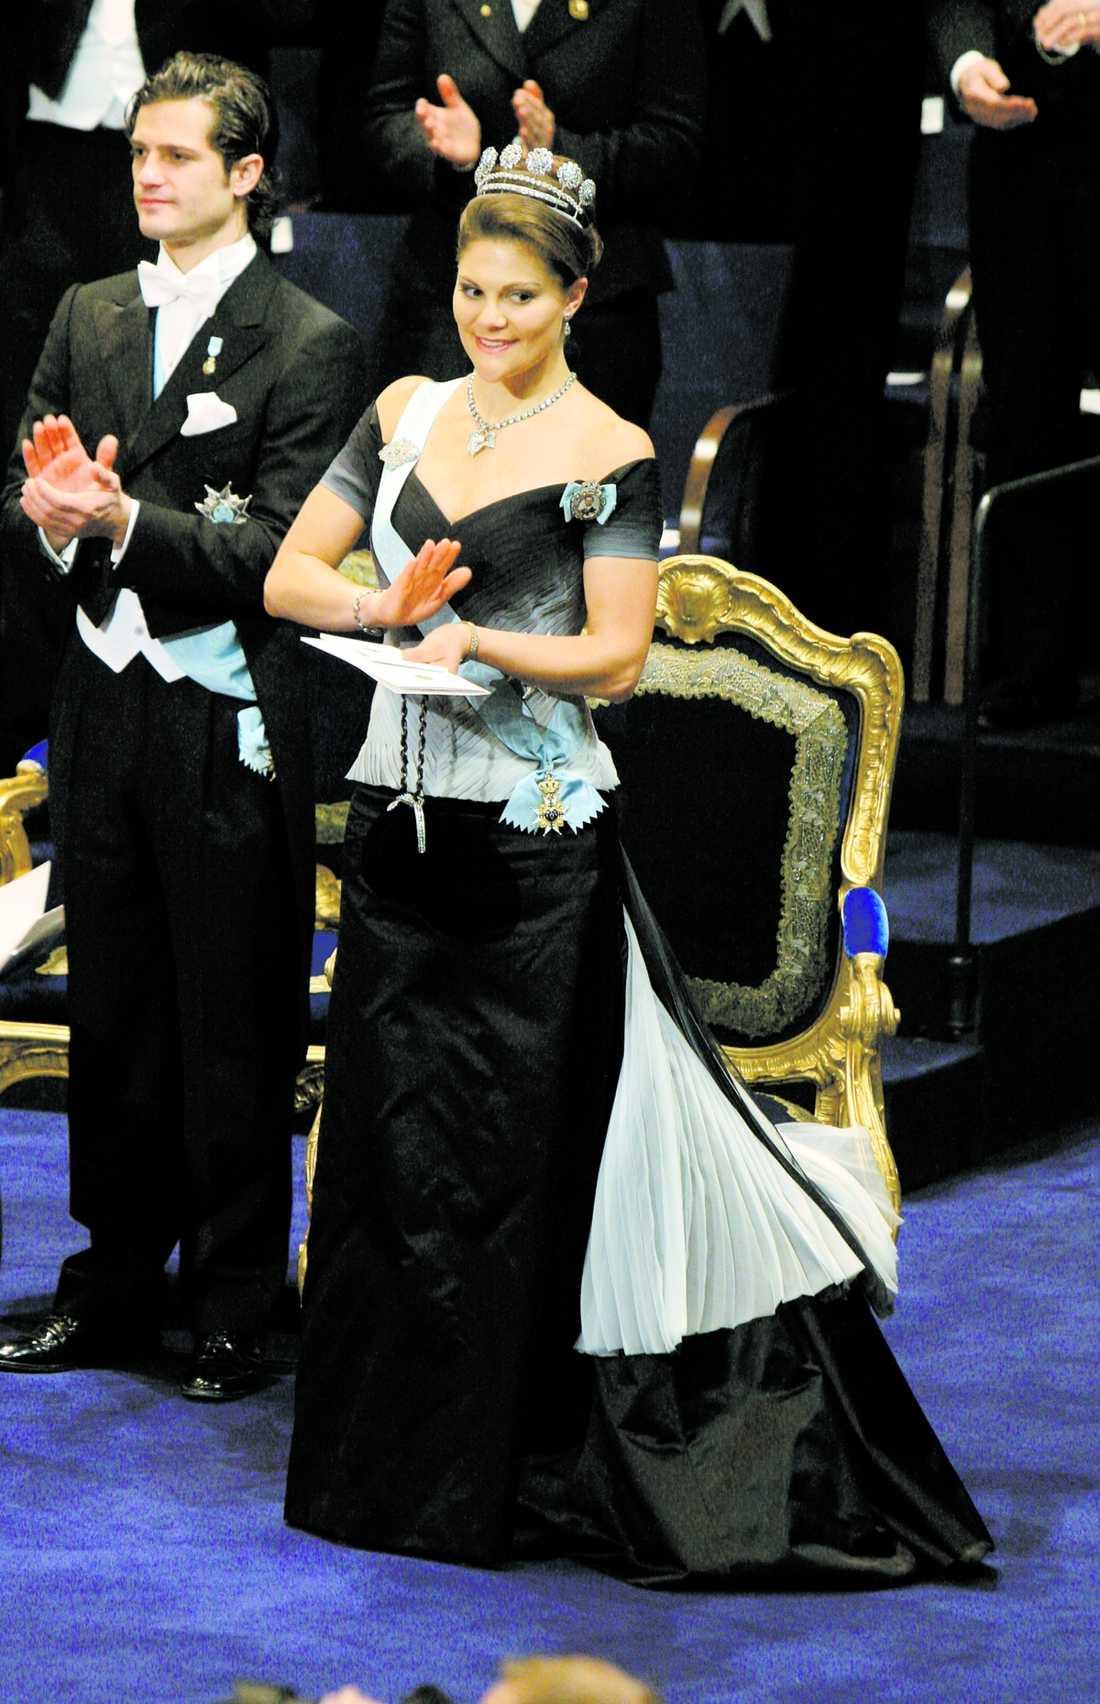 80e4b4962117 1 av 3   Foto: Scanpix. En favorit Kronprinsessan ...